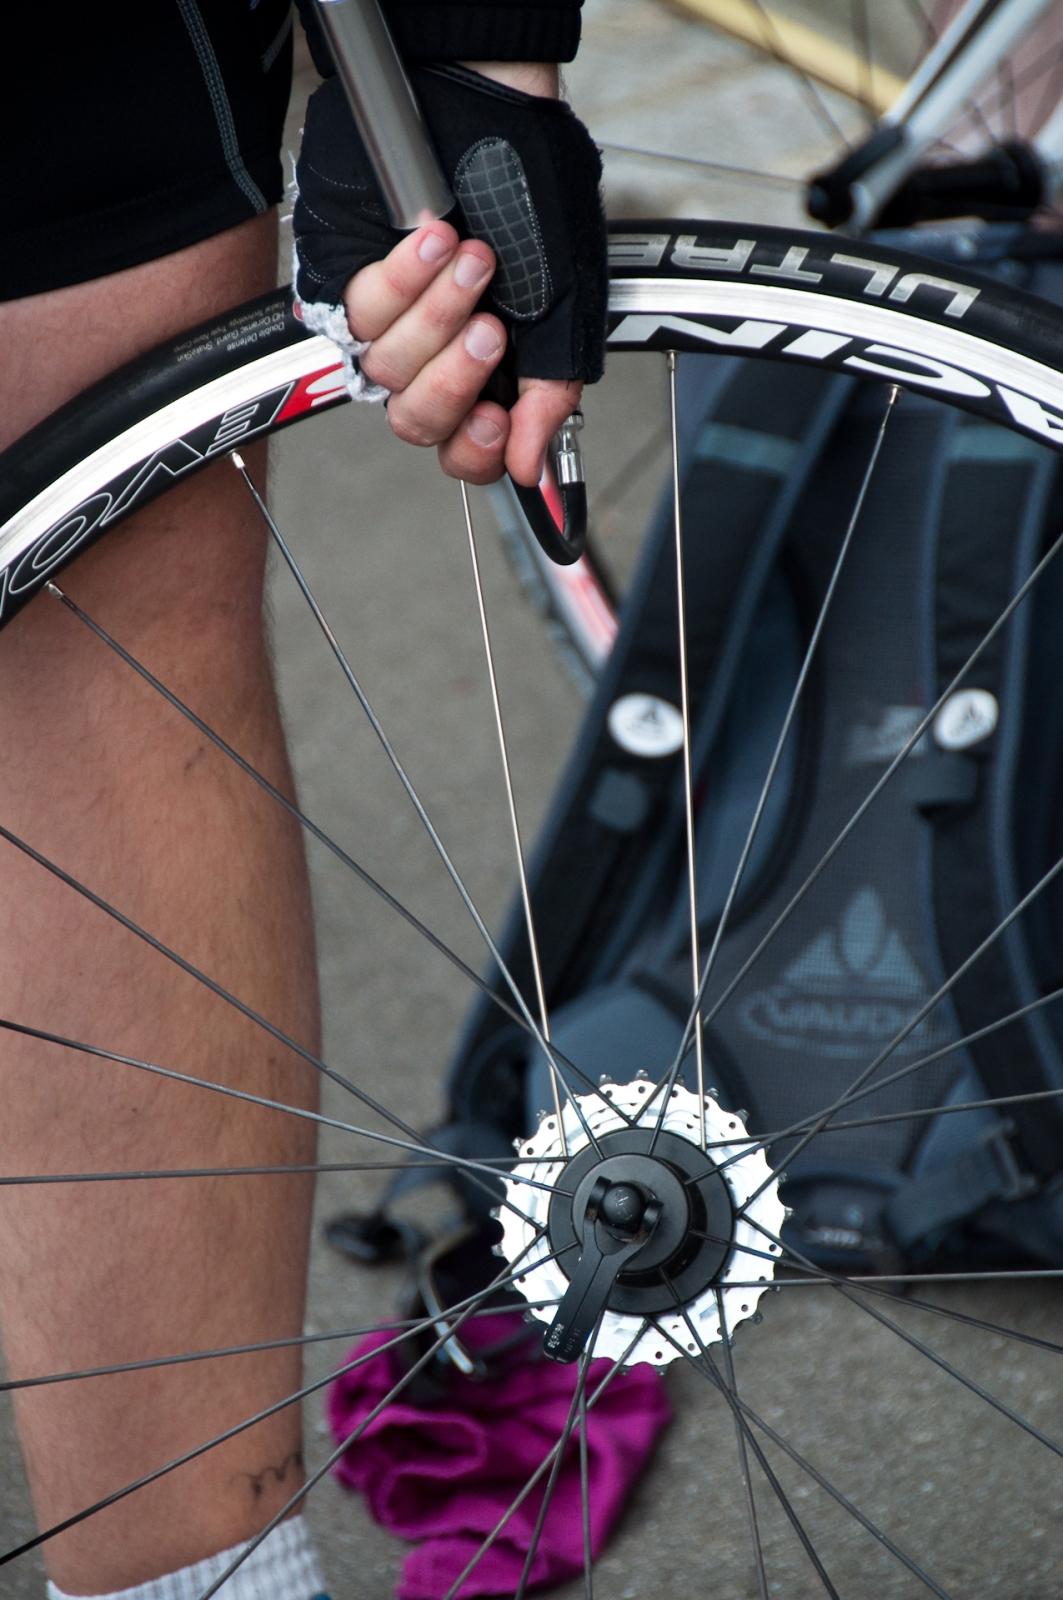 punka punktering flat tyre panne ultremo